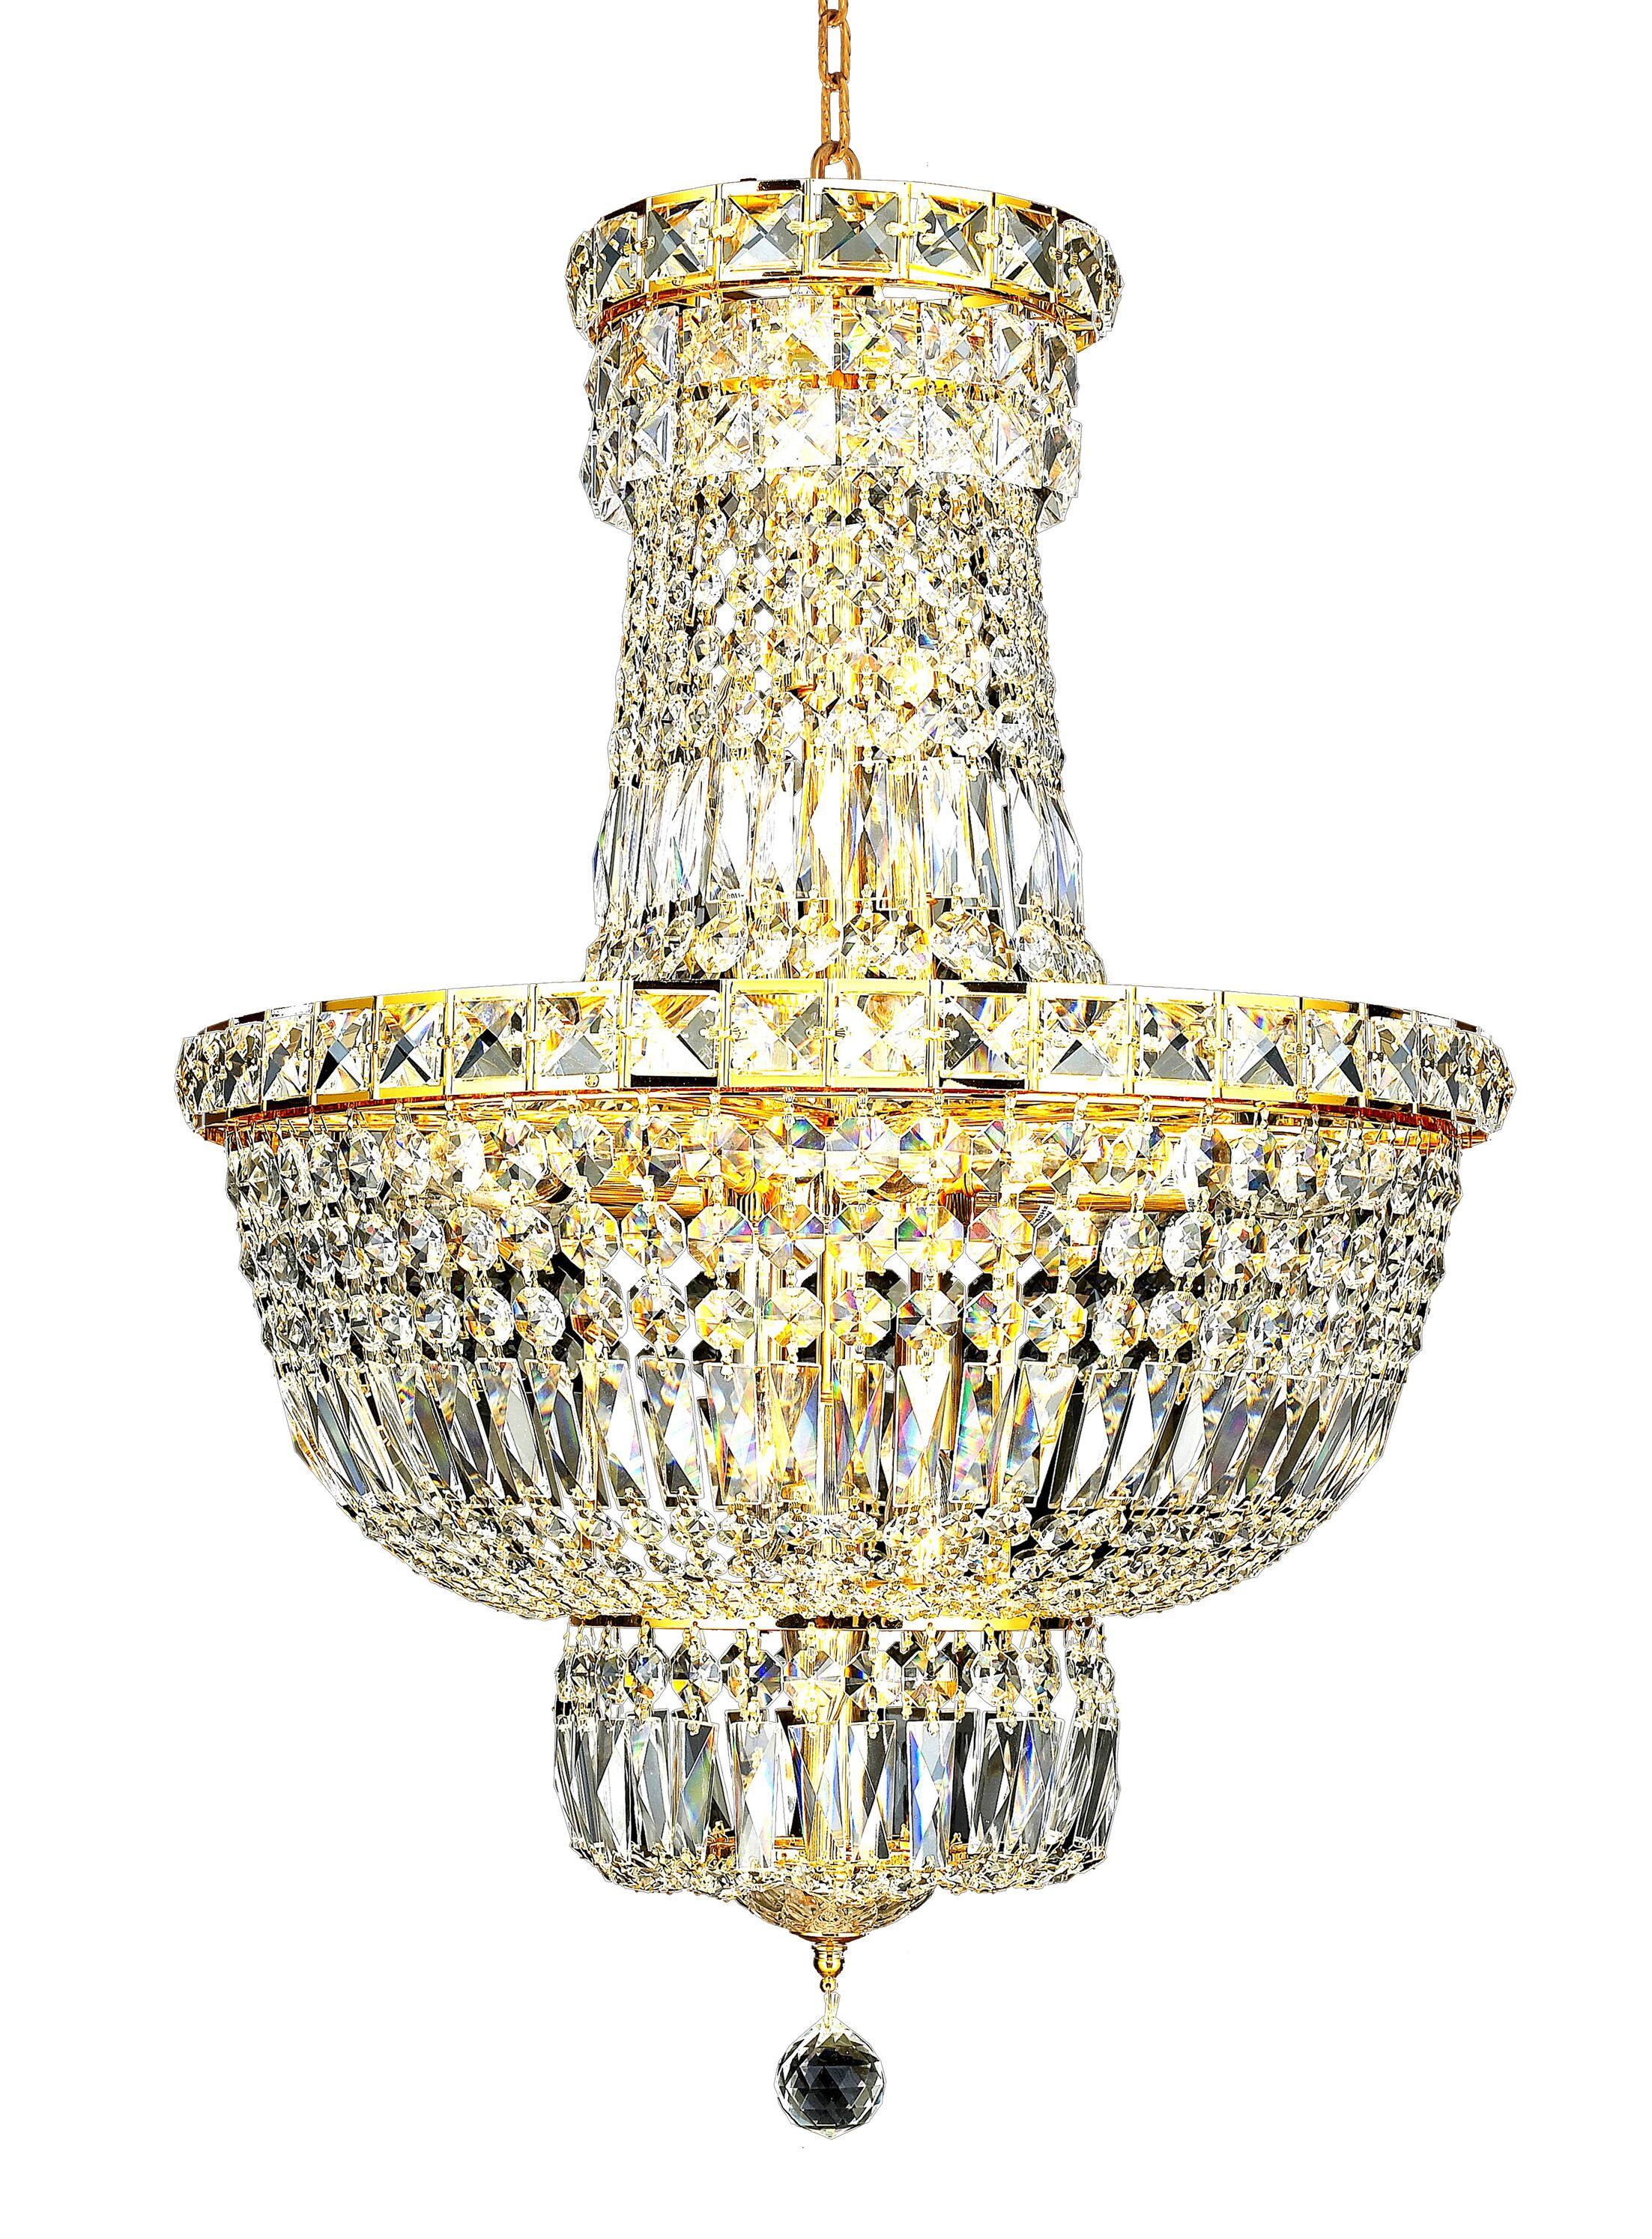 Fulham 12-Light Empire Chandelier Finish: Gold, Crystal: Strass Swarovski